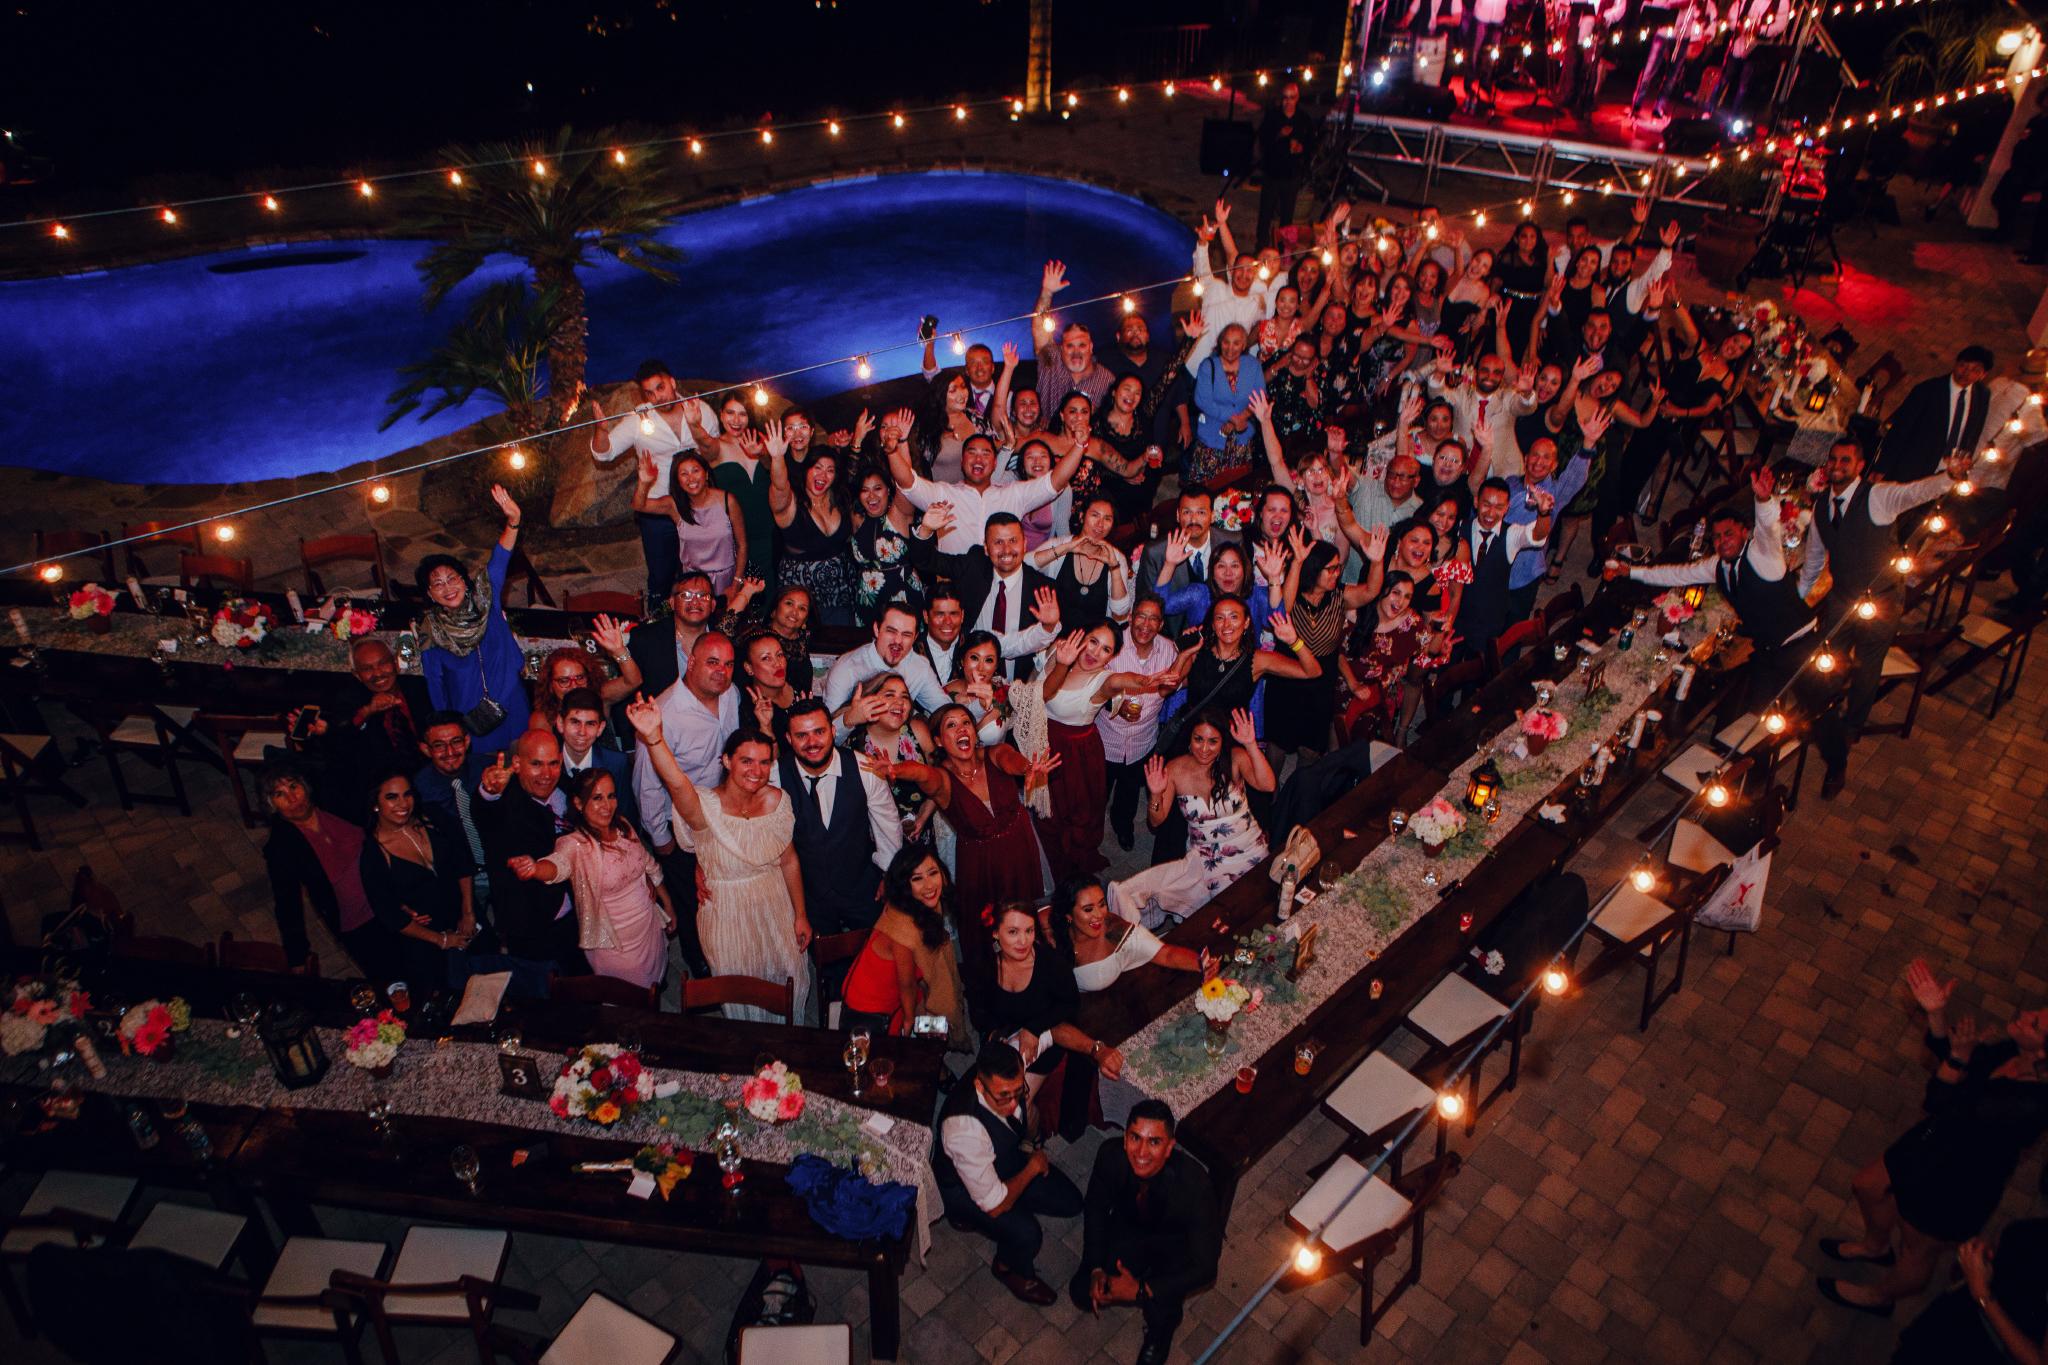 San Diego Wedding Photographer | big group shot at the wedding reception in Montana Cielo